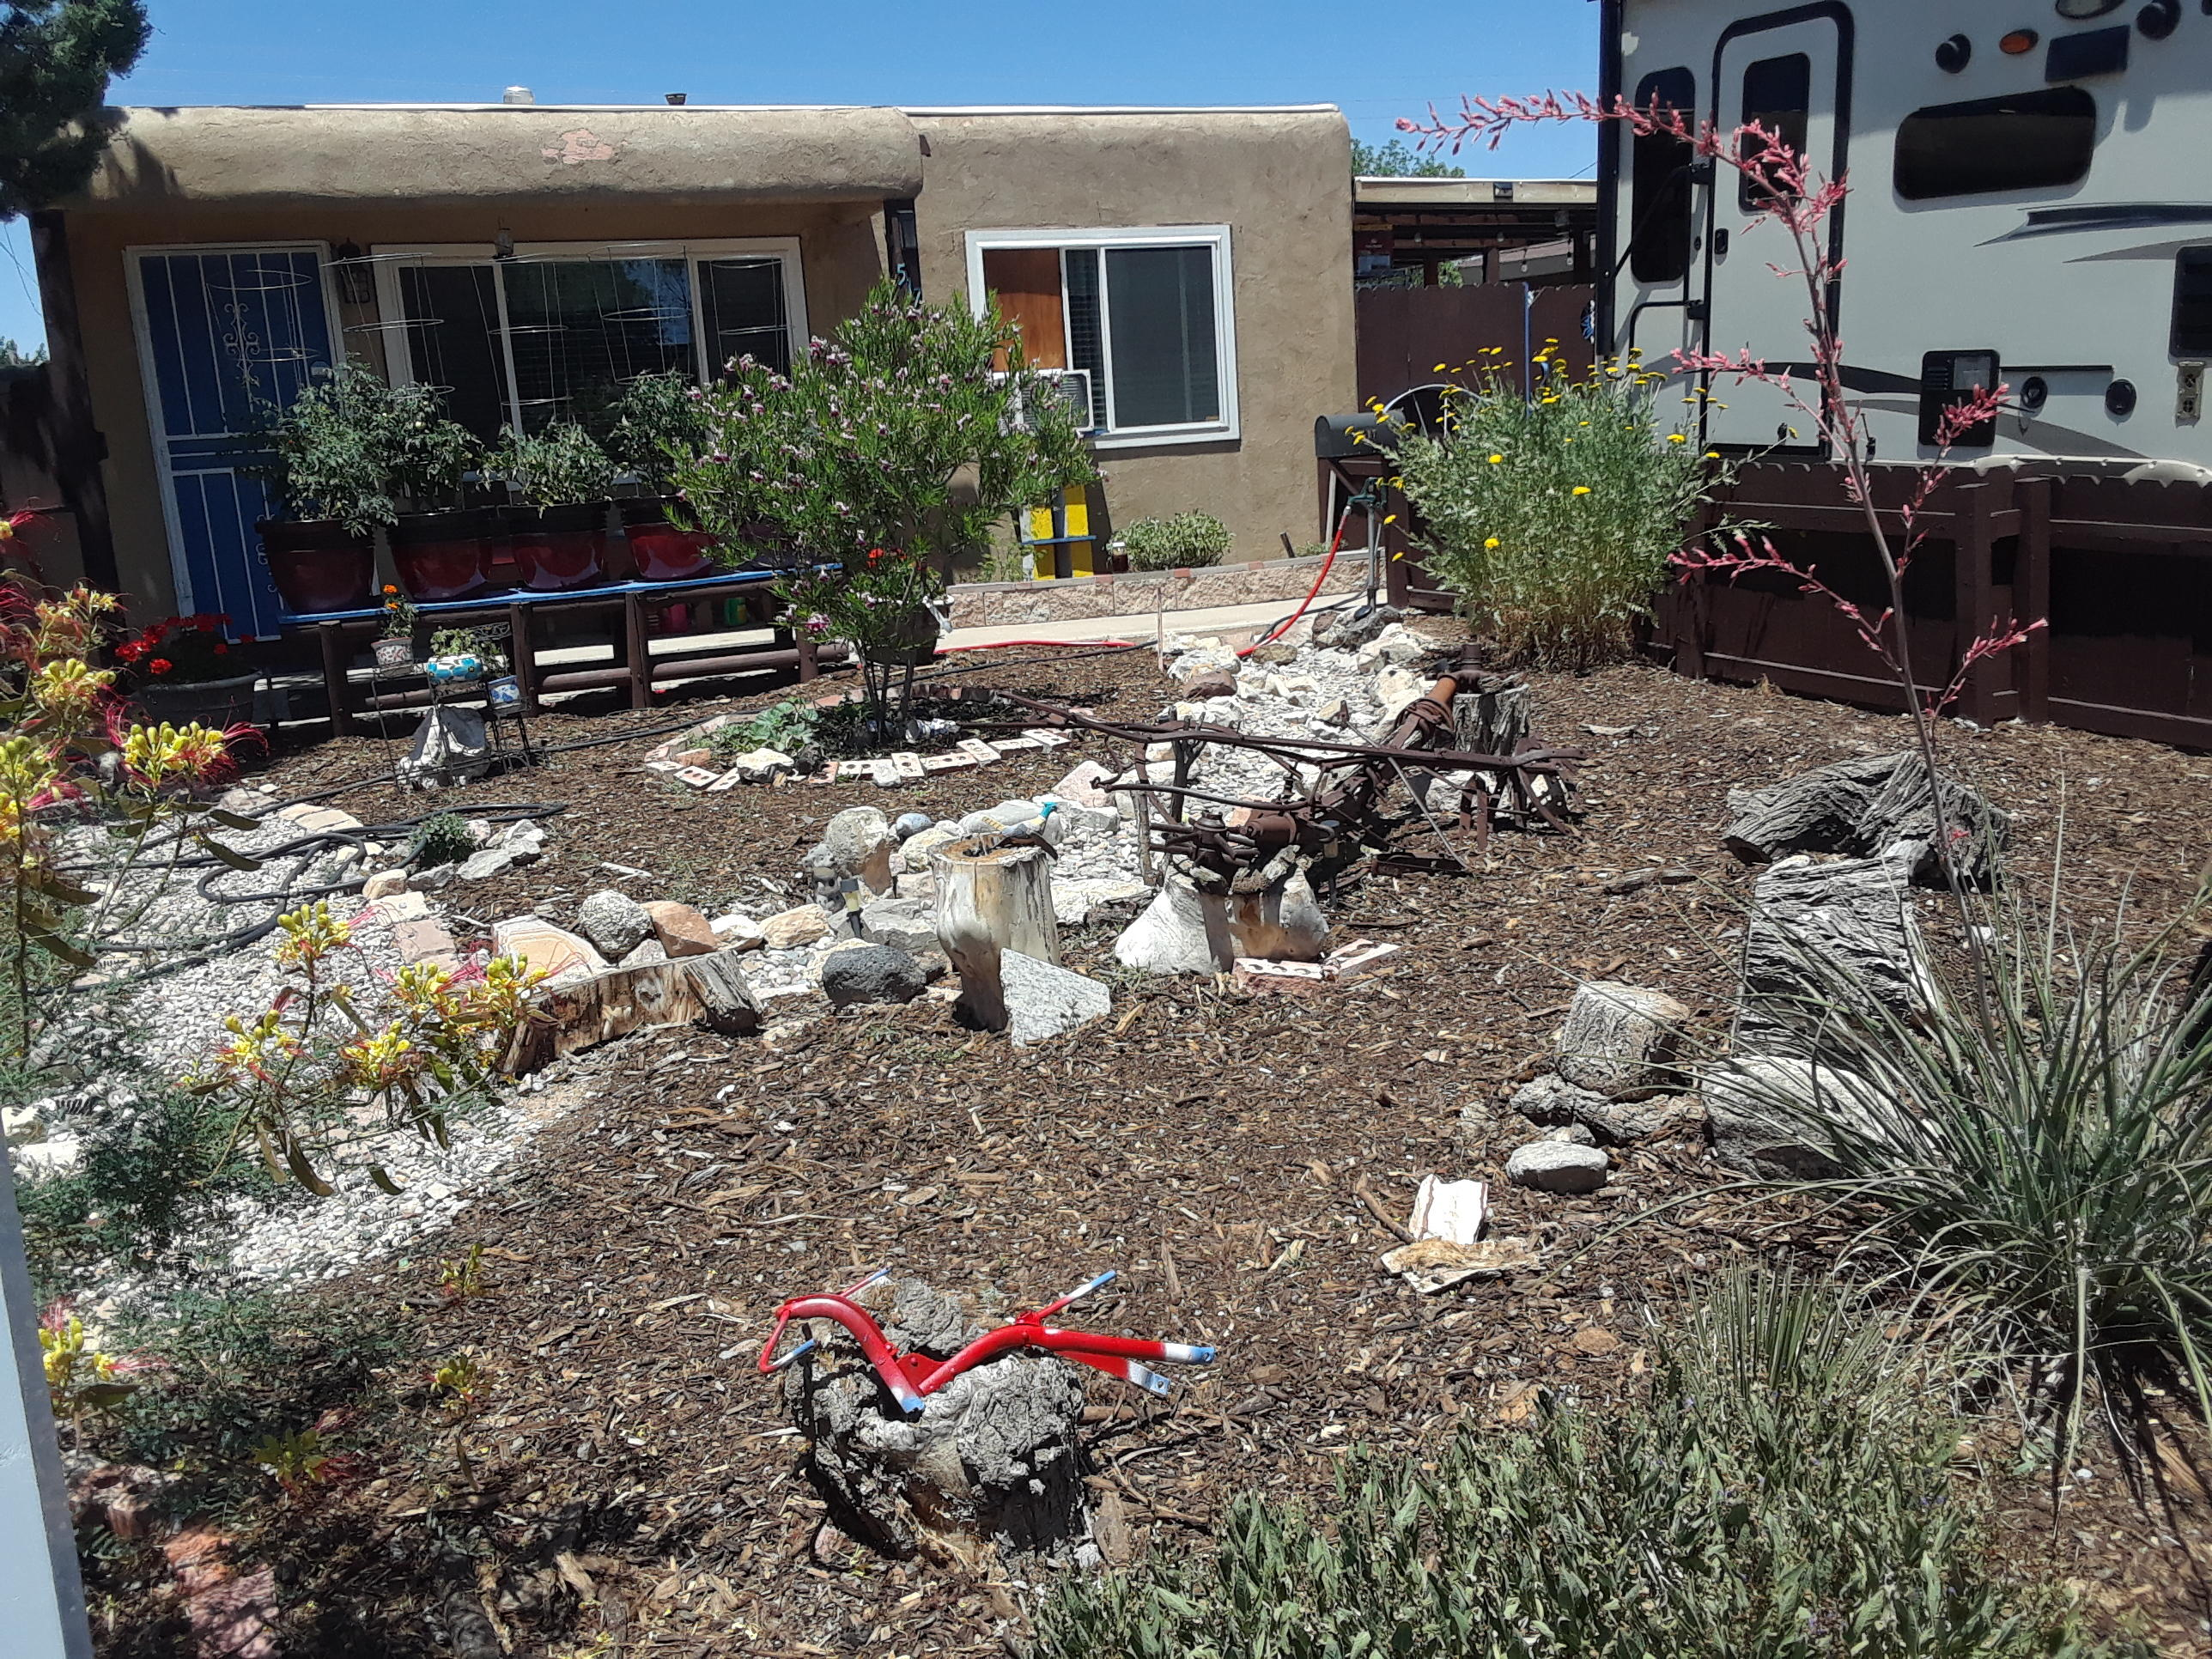 517 TEXAS Street SE Property Photo - Albuquerque, NM real estate listing